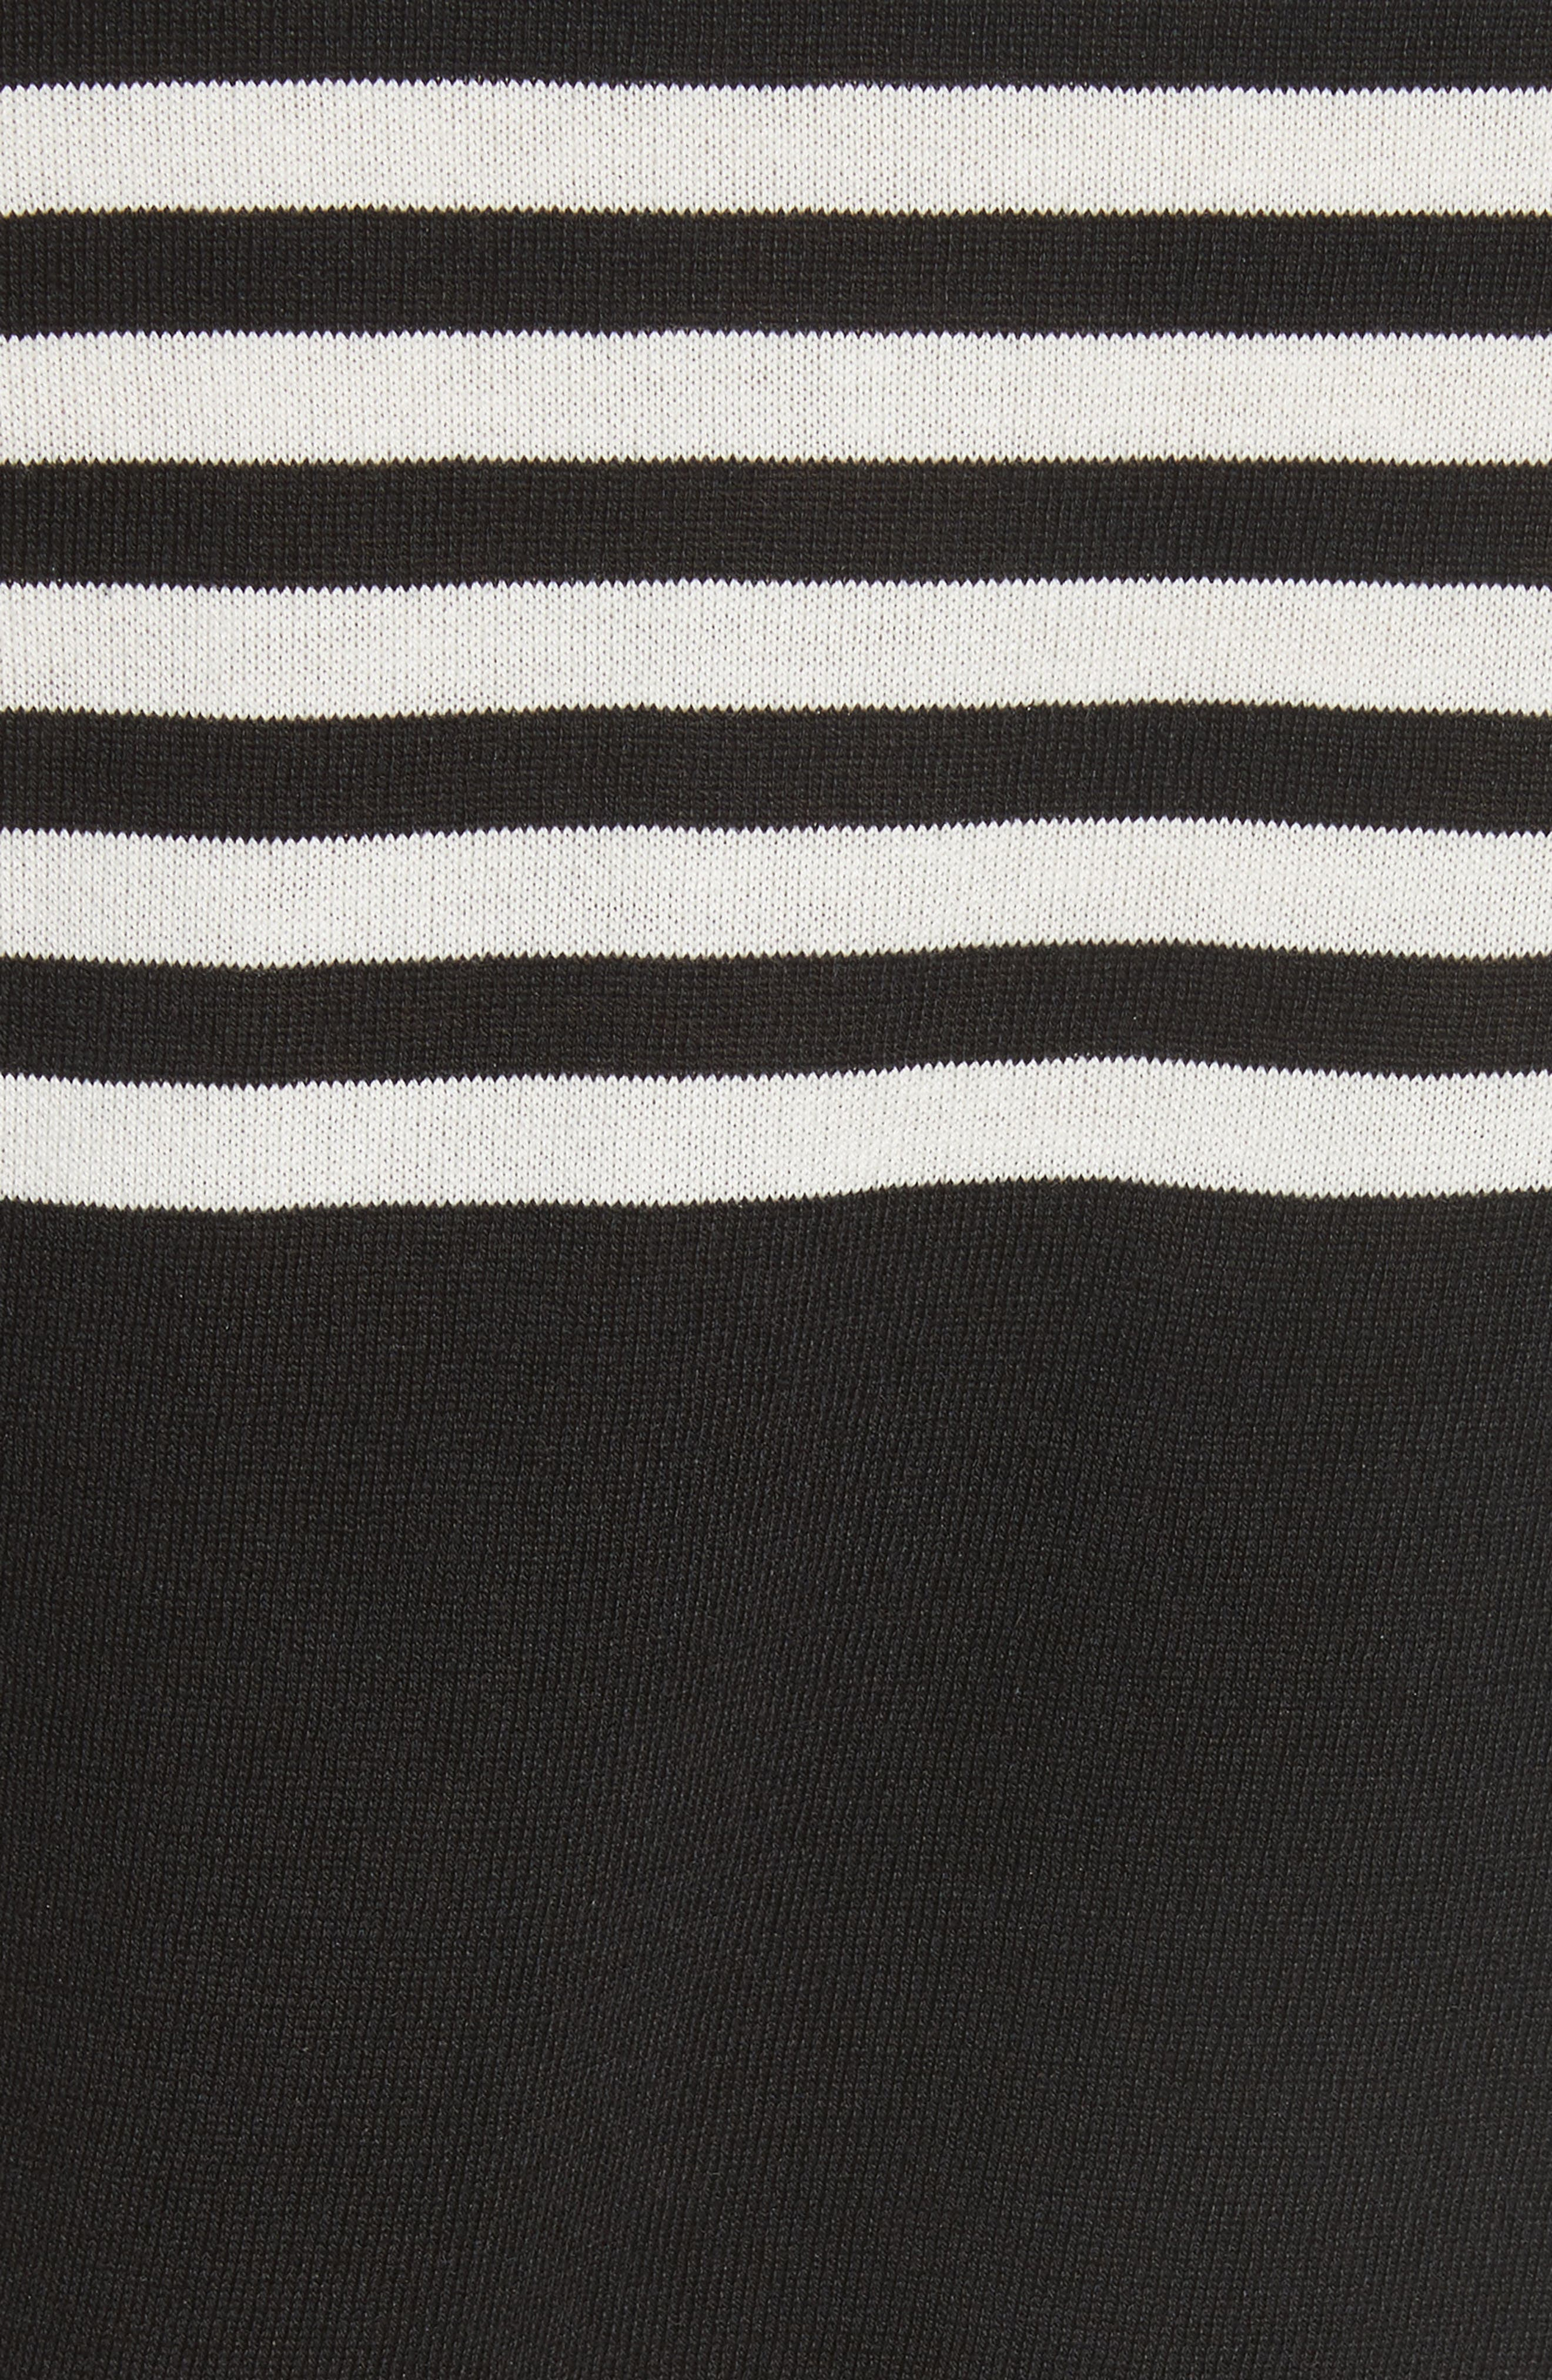 Stripe Silk & Cotton Sweater,                             Alternate thumbnail 5, color,                             Black